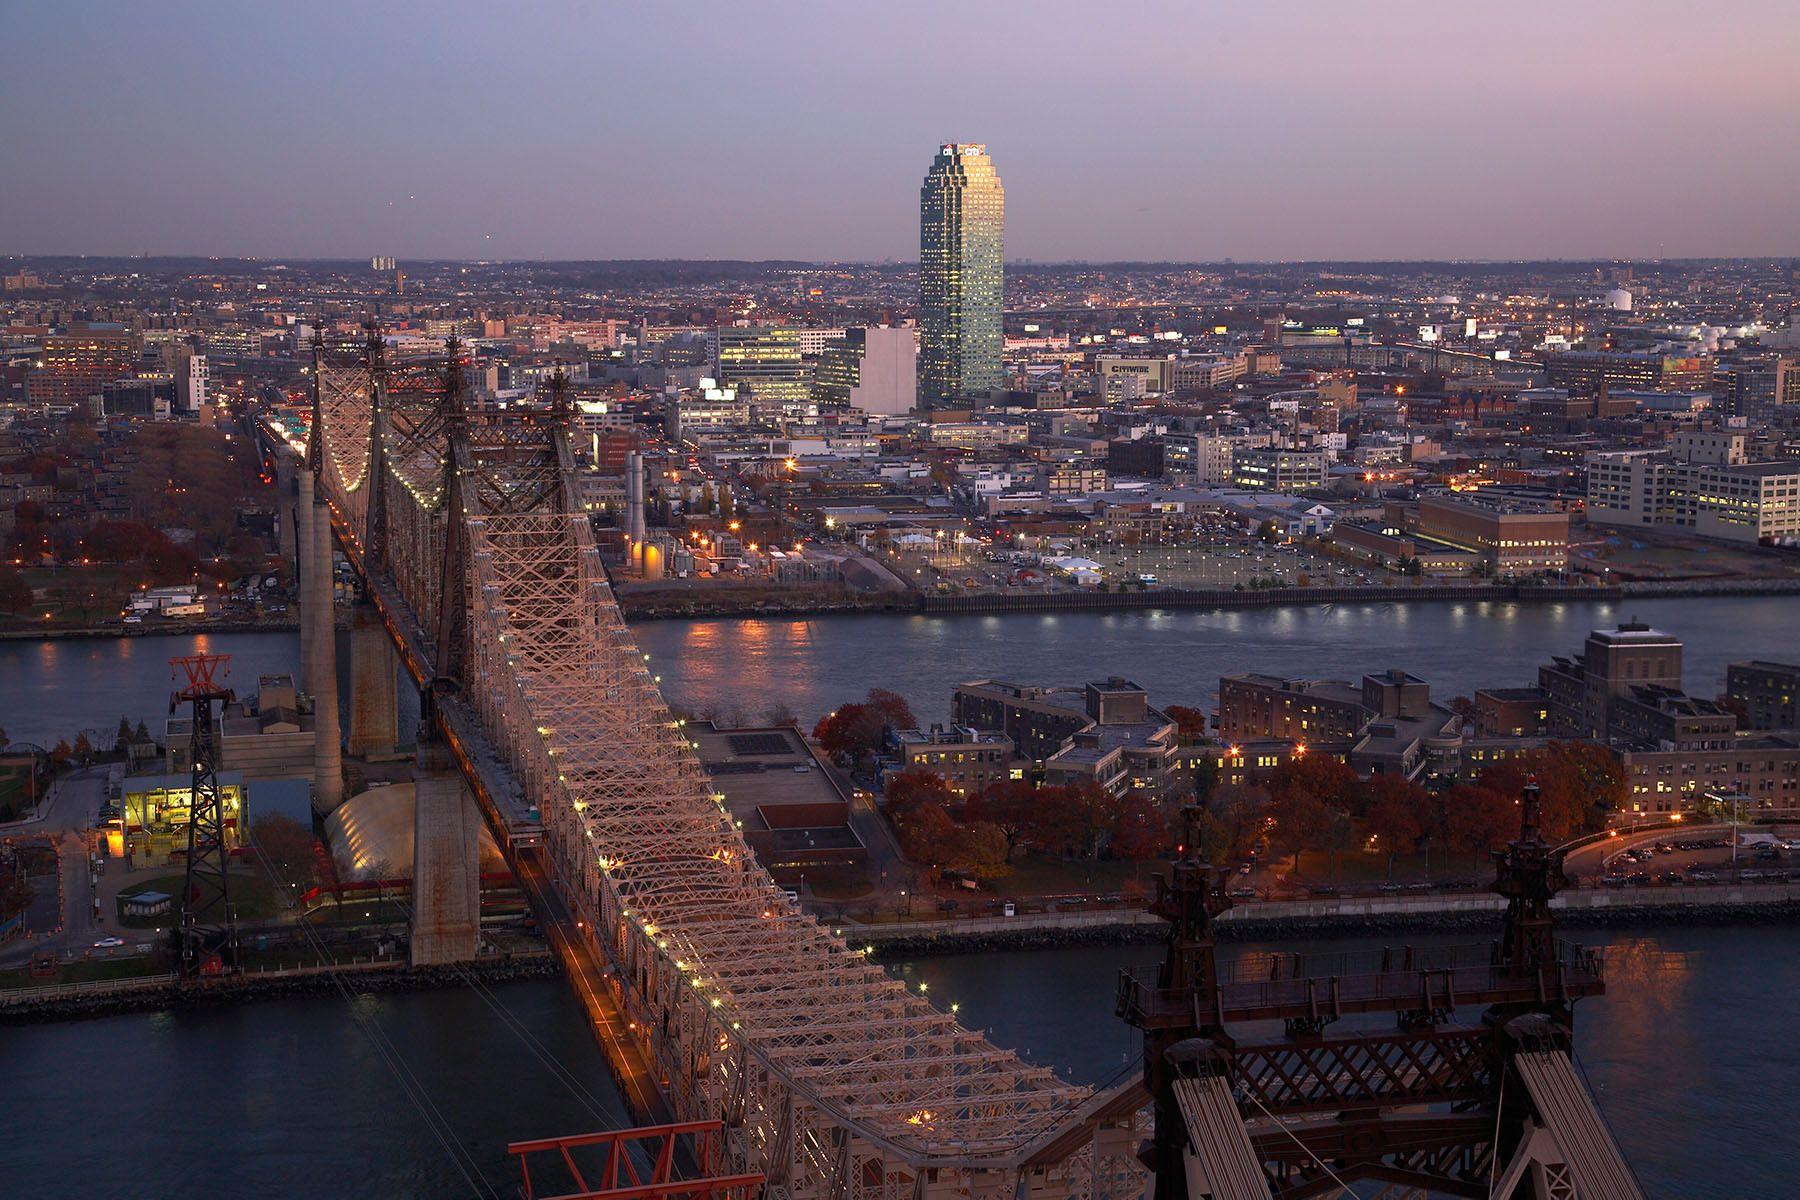 The East River & 59th Street Bridge